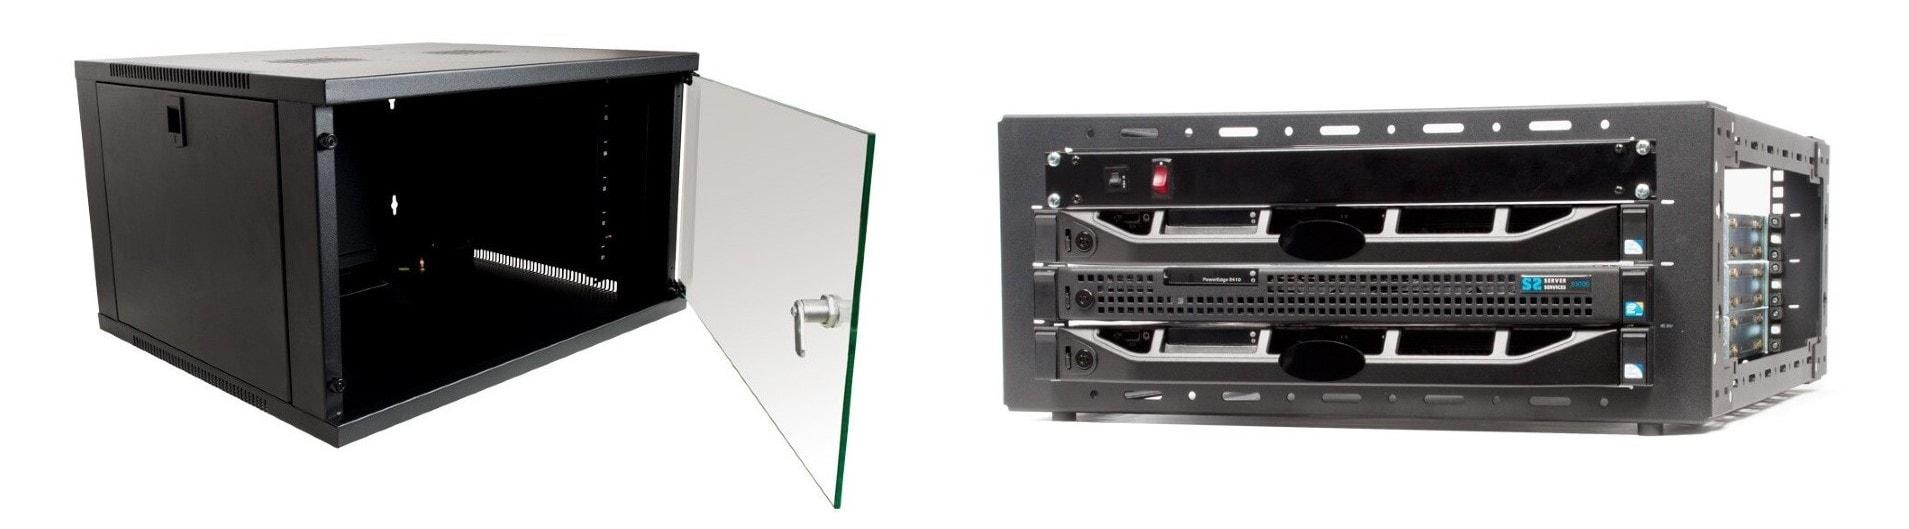 Desktop Server Racks